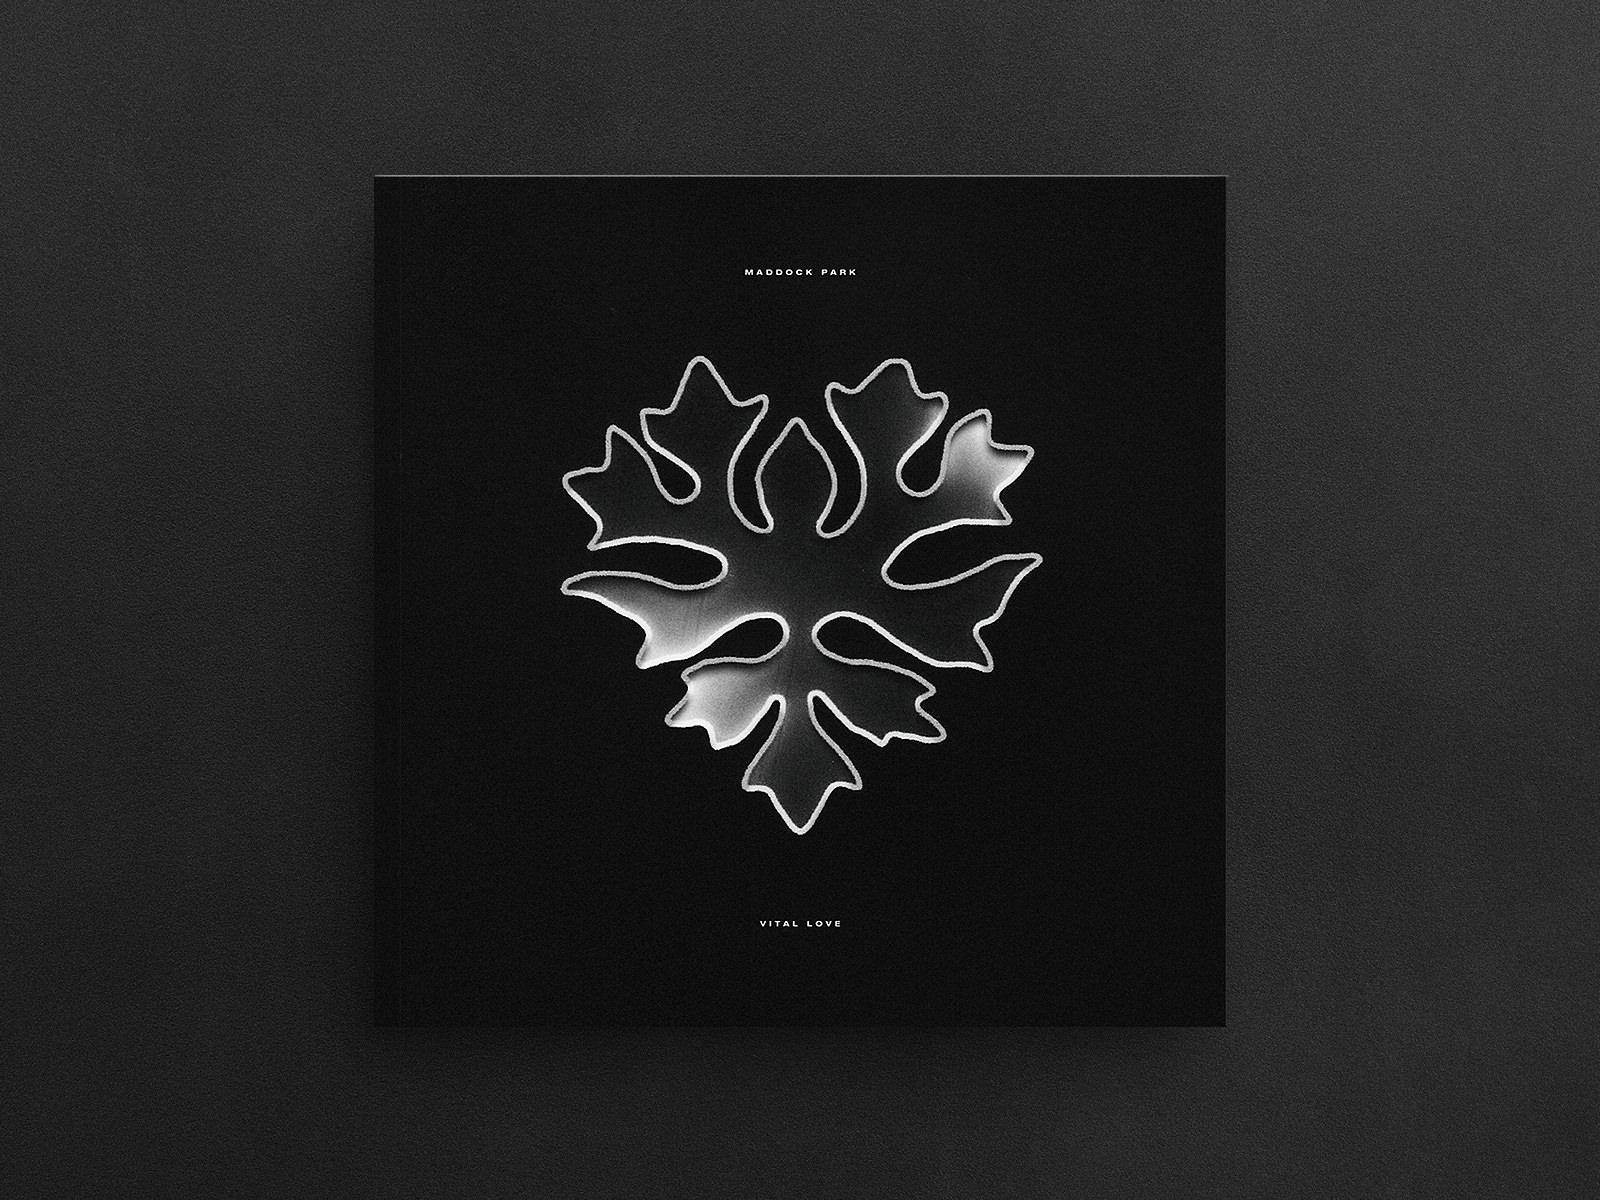 Vital Love Album Cover Draft 1